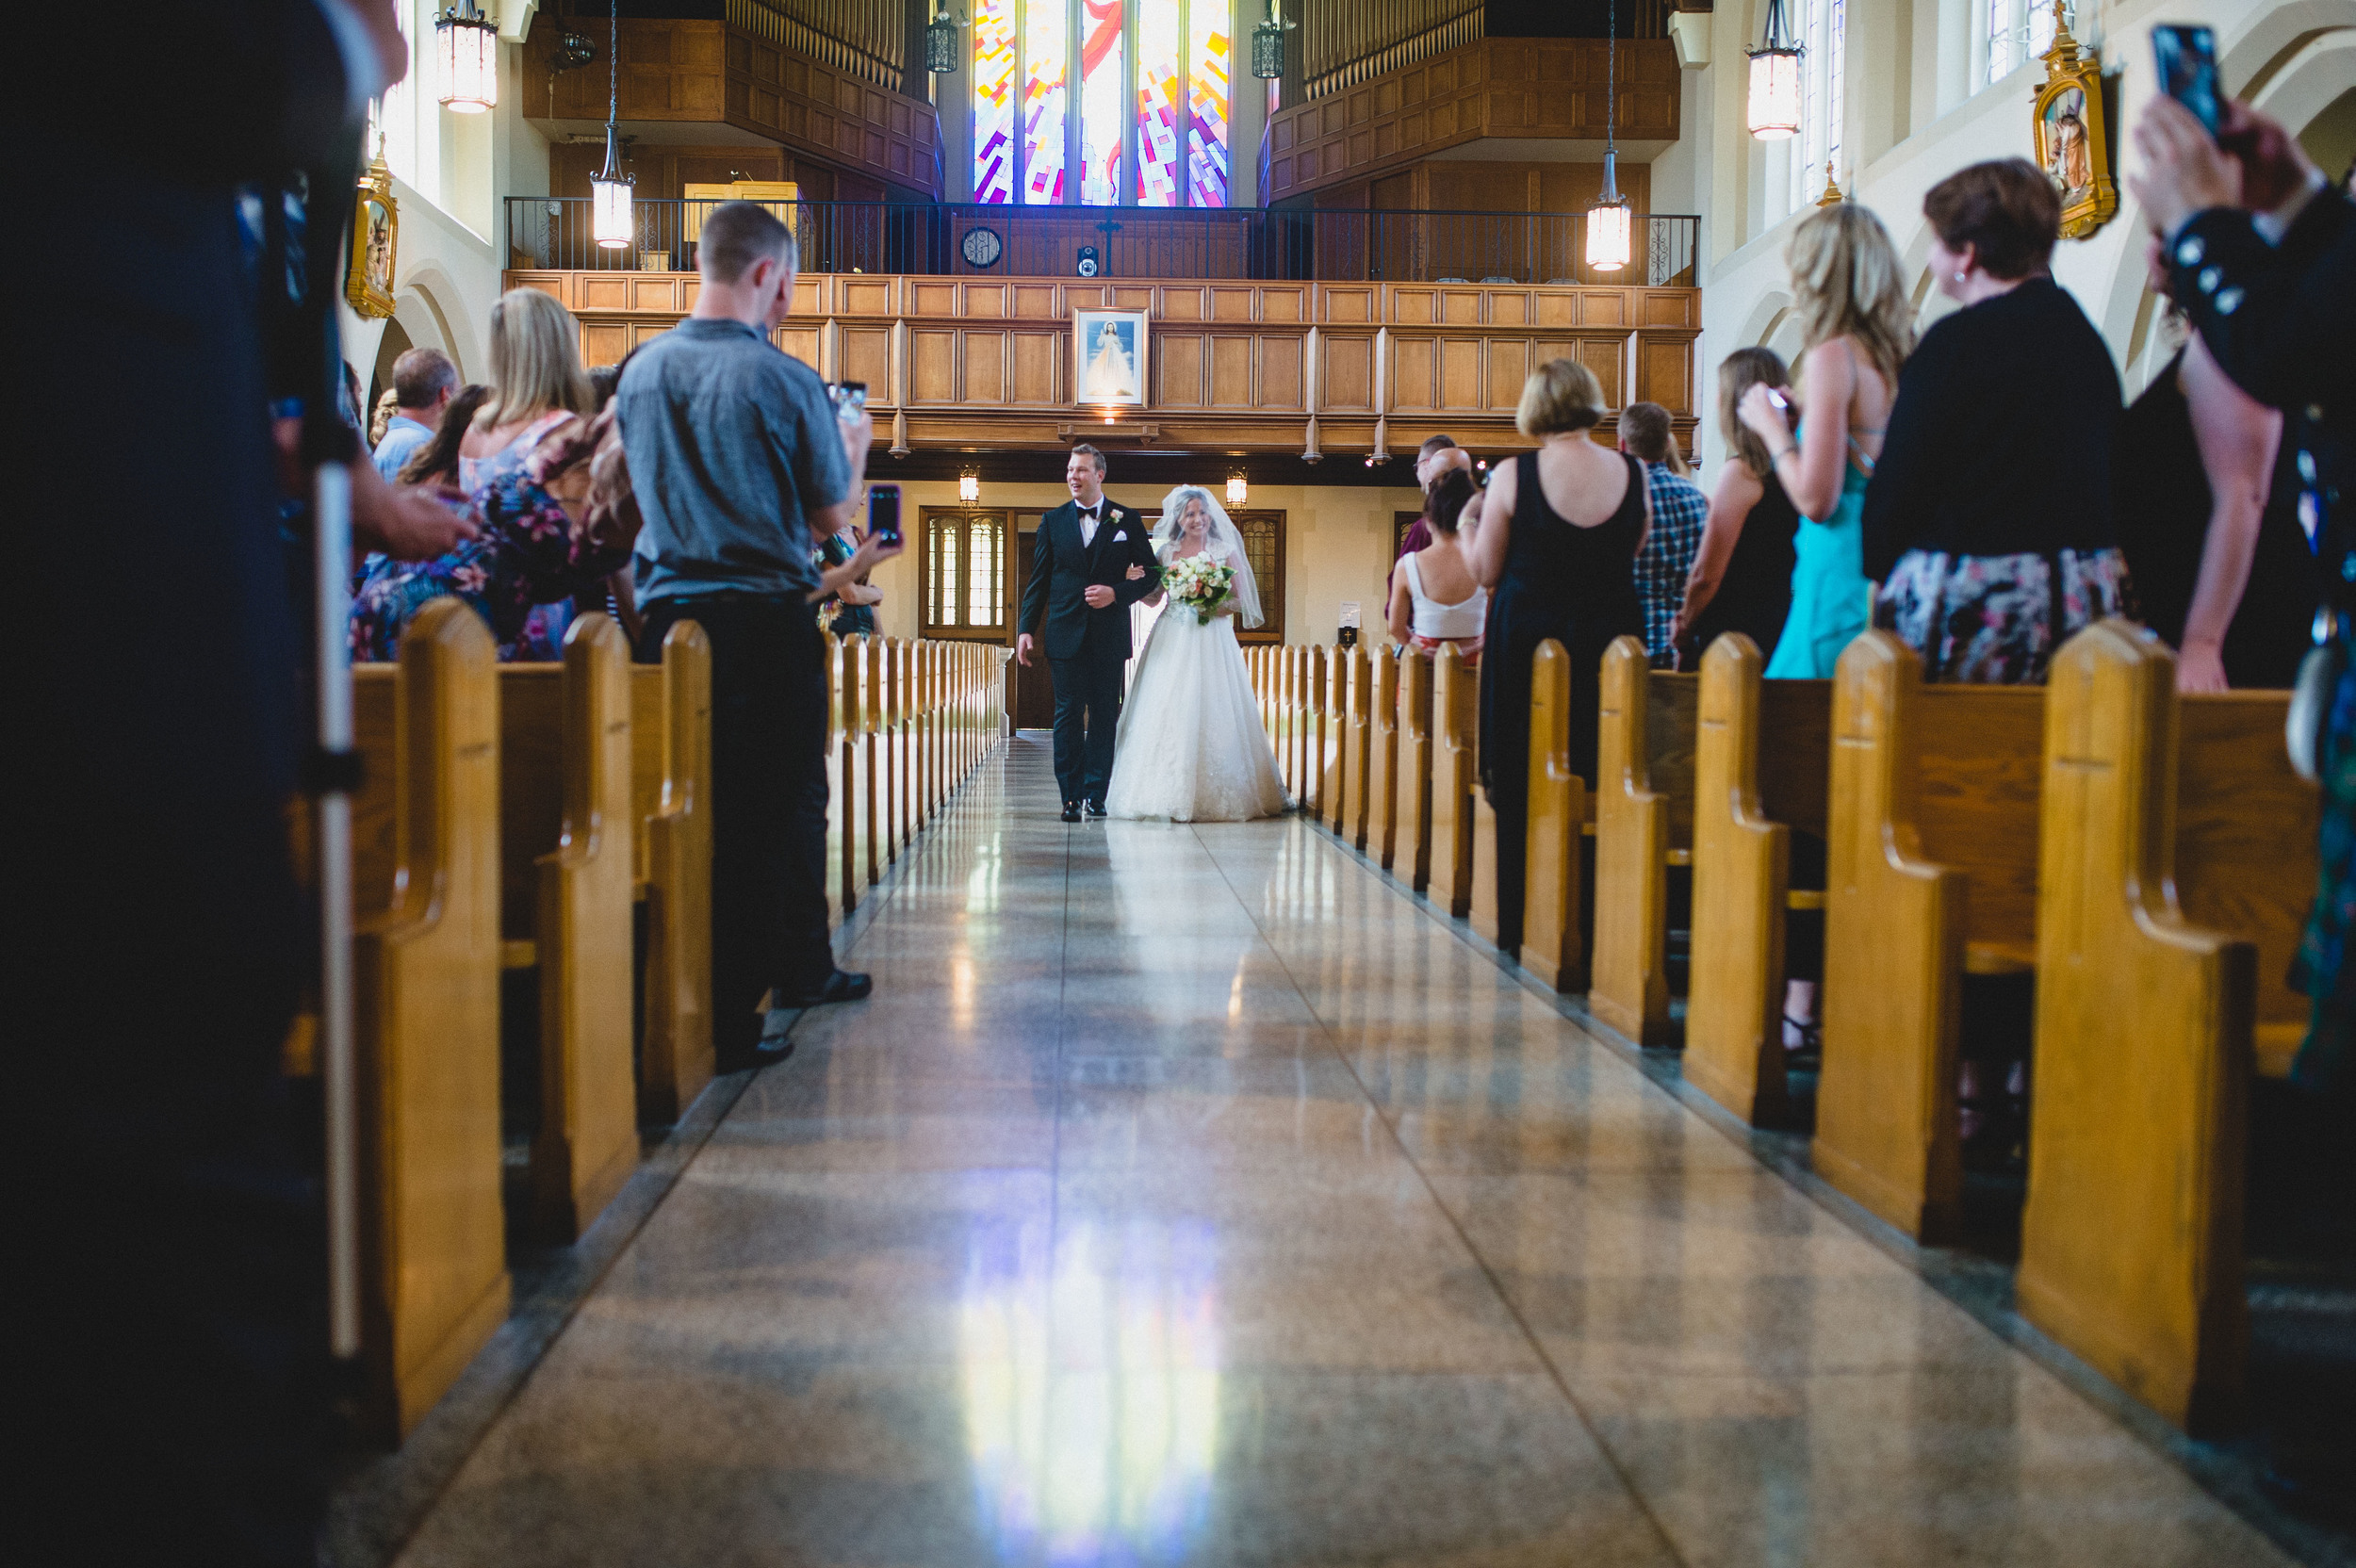 Vancouver St Augustine 's Church wedding photographer edward lai photography